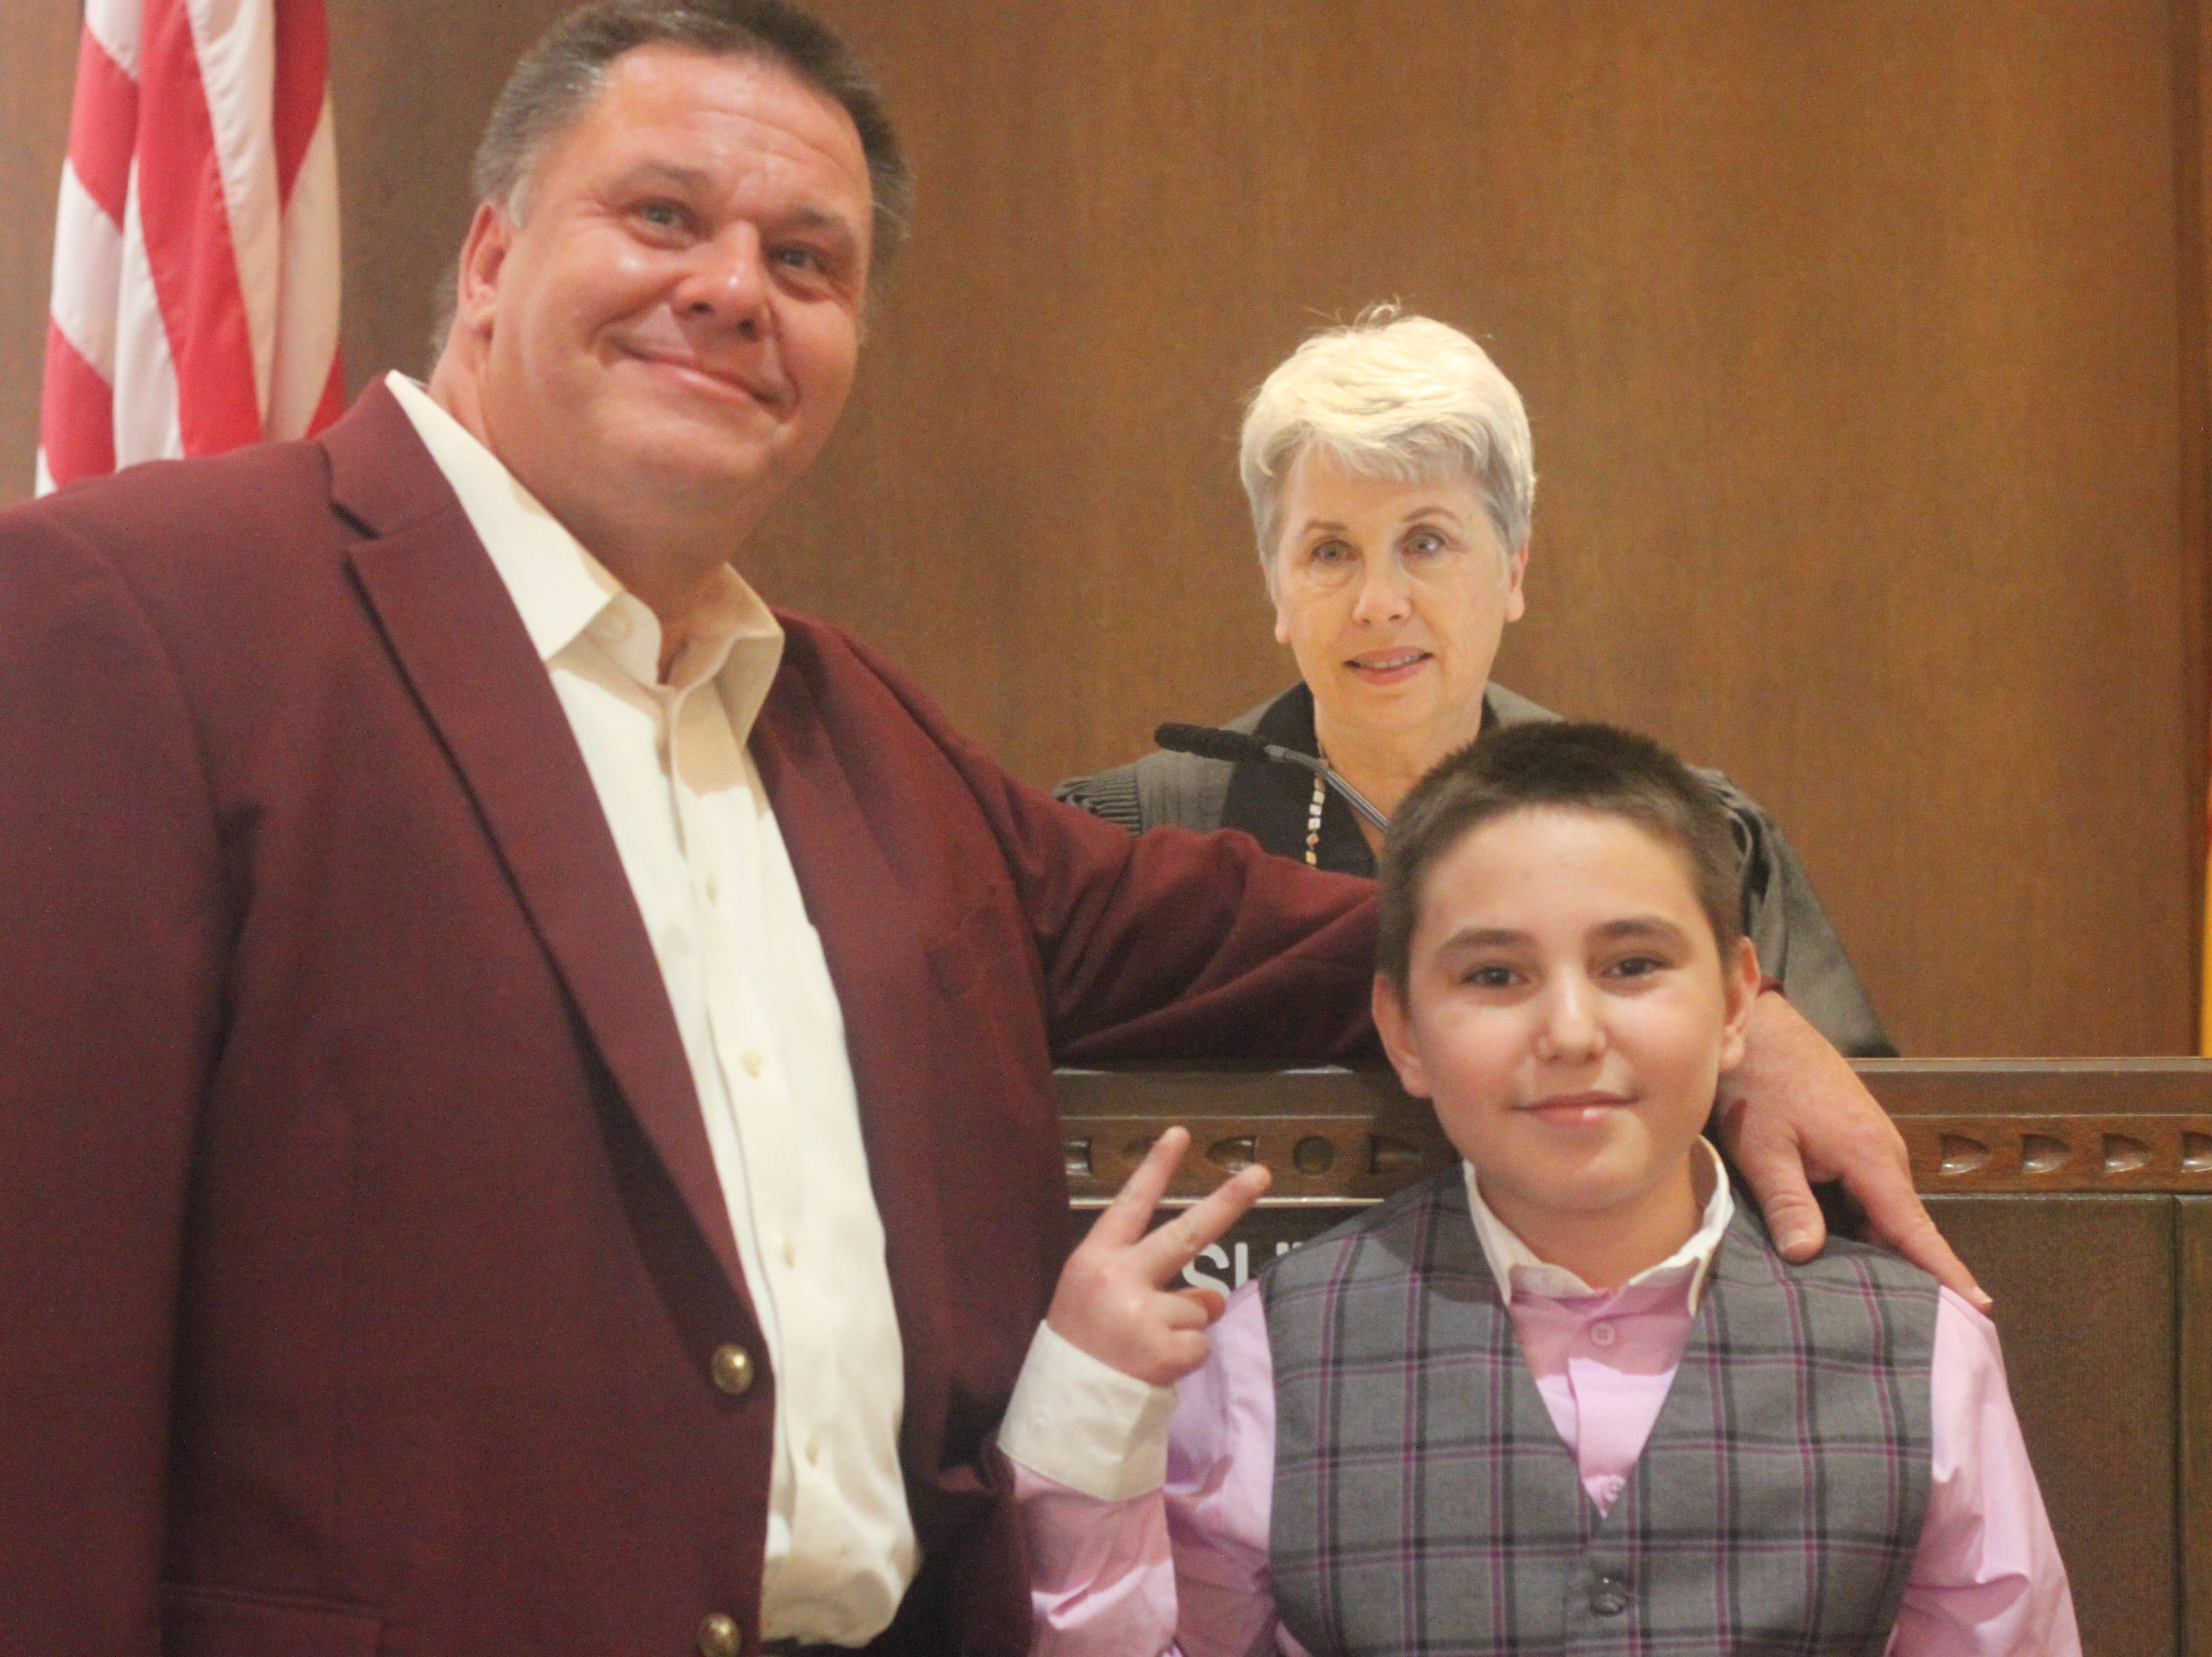 Nathaniel Zacek (right) celebrates his adoption to his father Glenn Zacek, Nov. 9, 2018 in the Eddy County Courthouse.